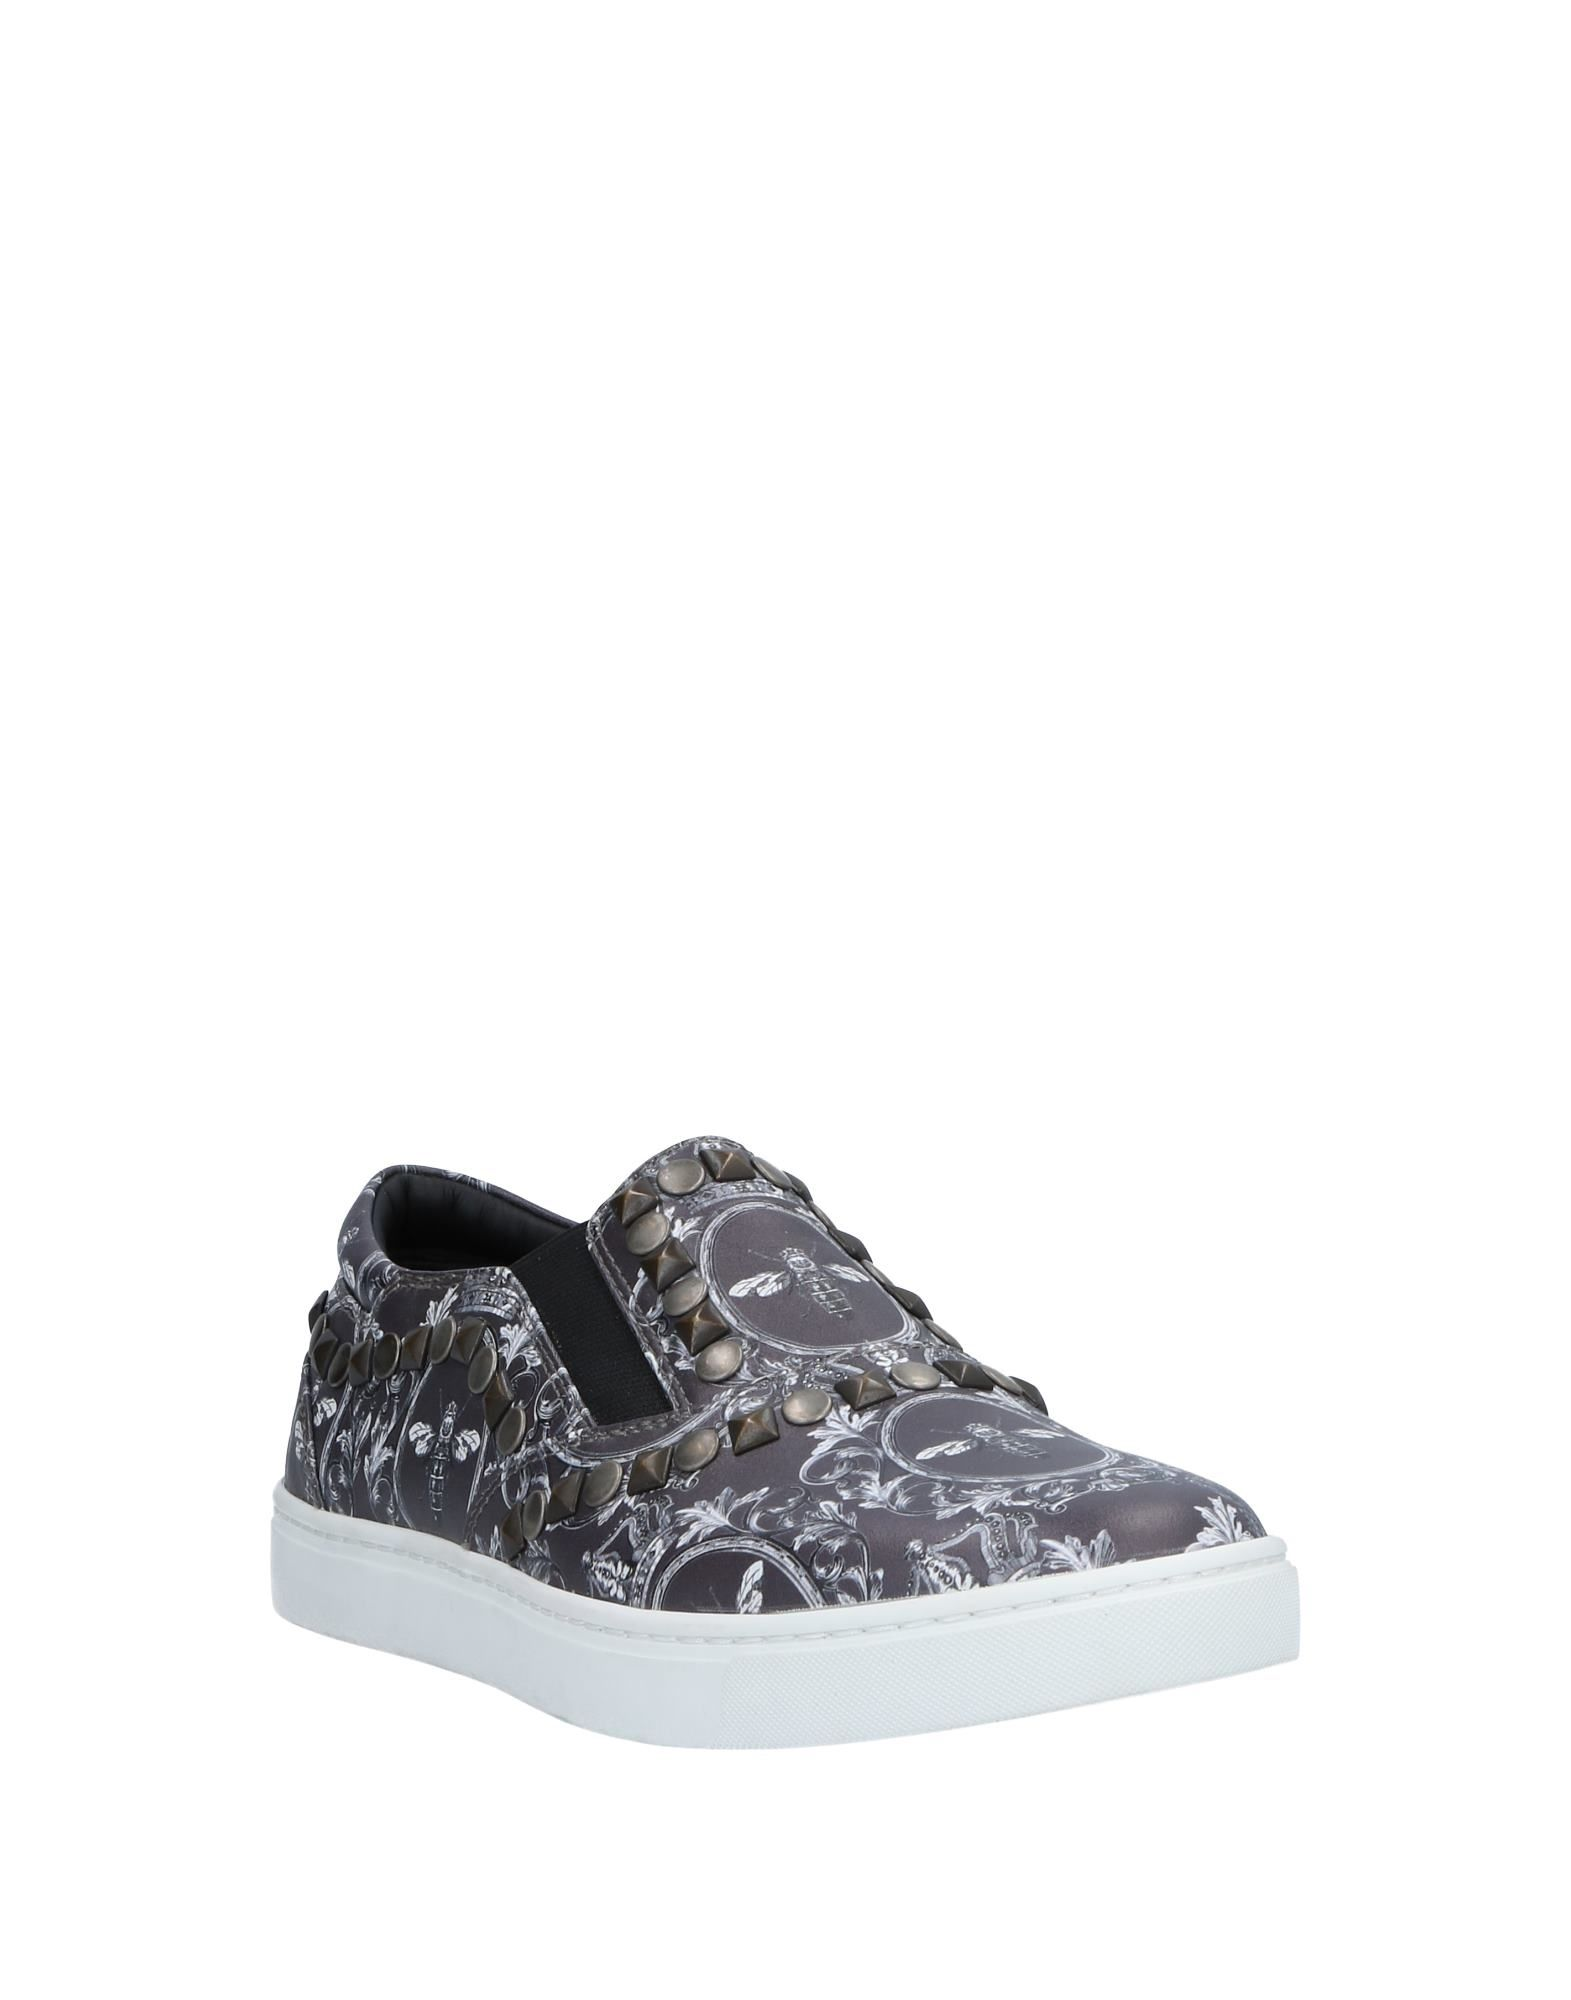 Dolce & Gabbana Sneakers Herren  11523064BL Gute Qualität beliebte Schuhe